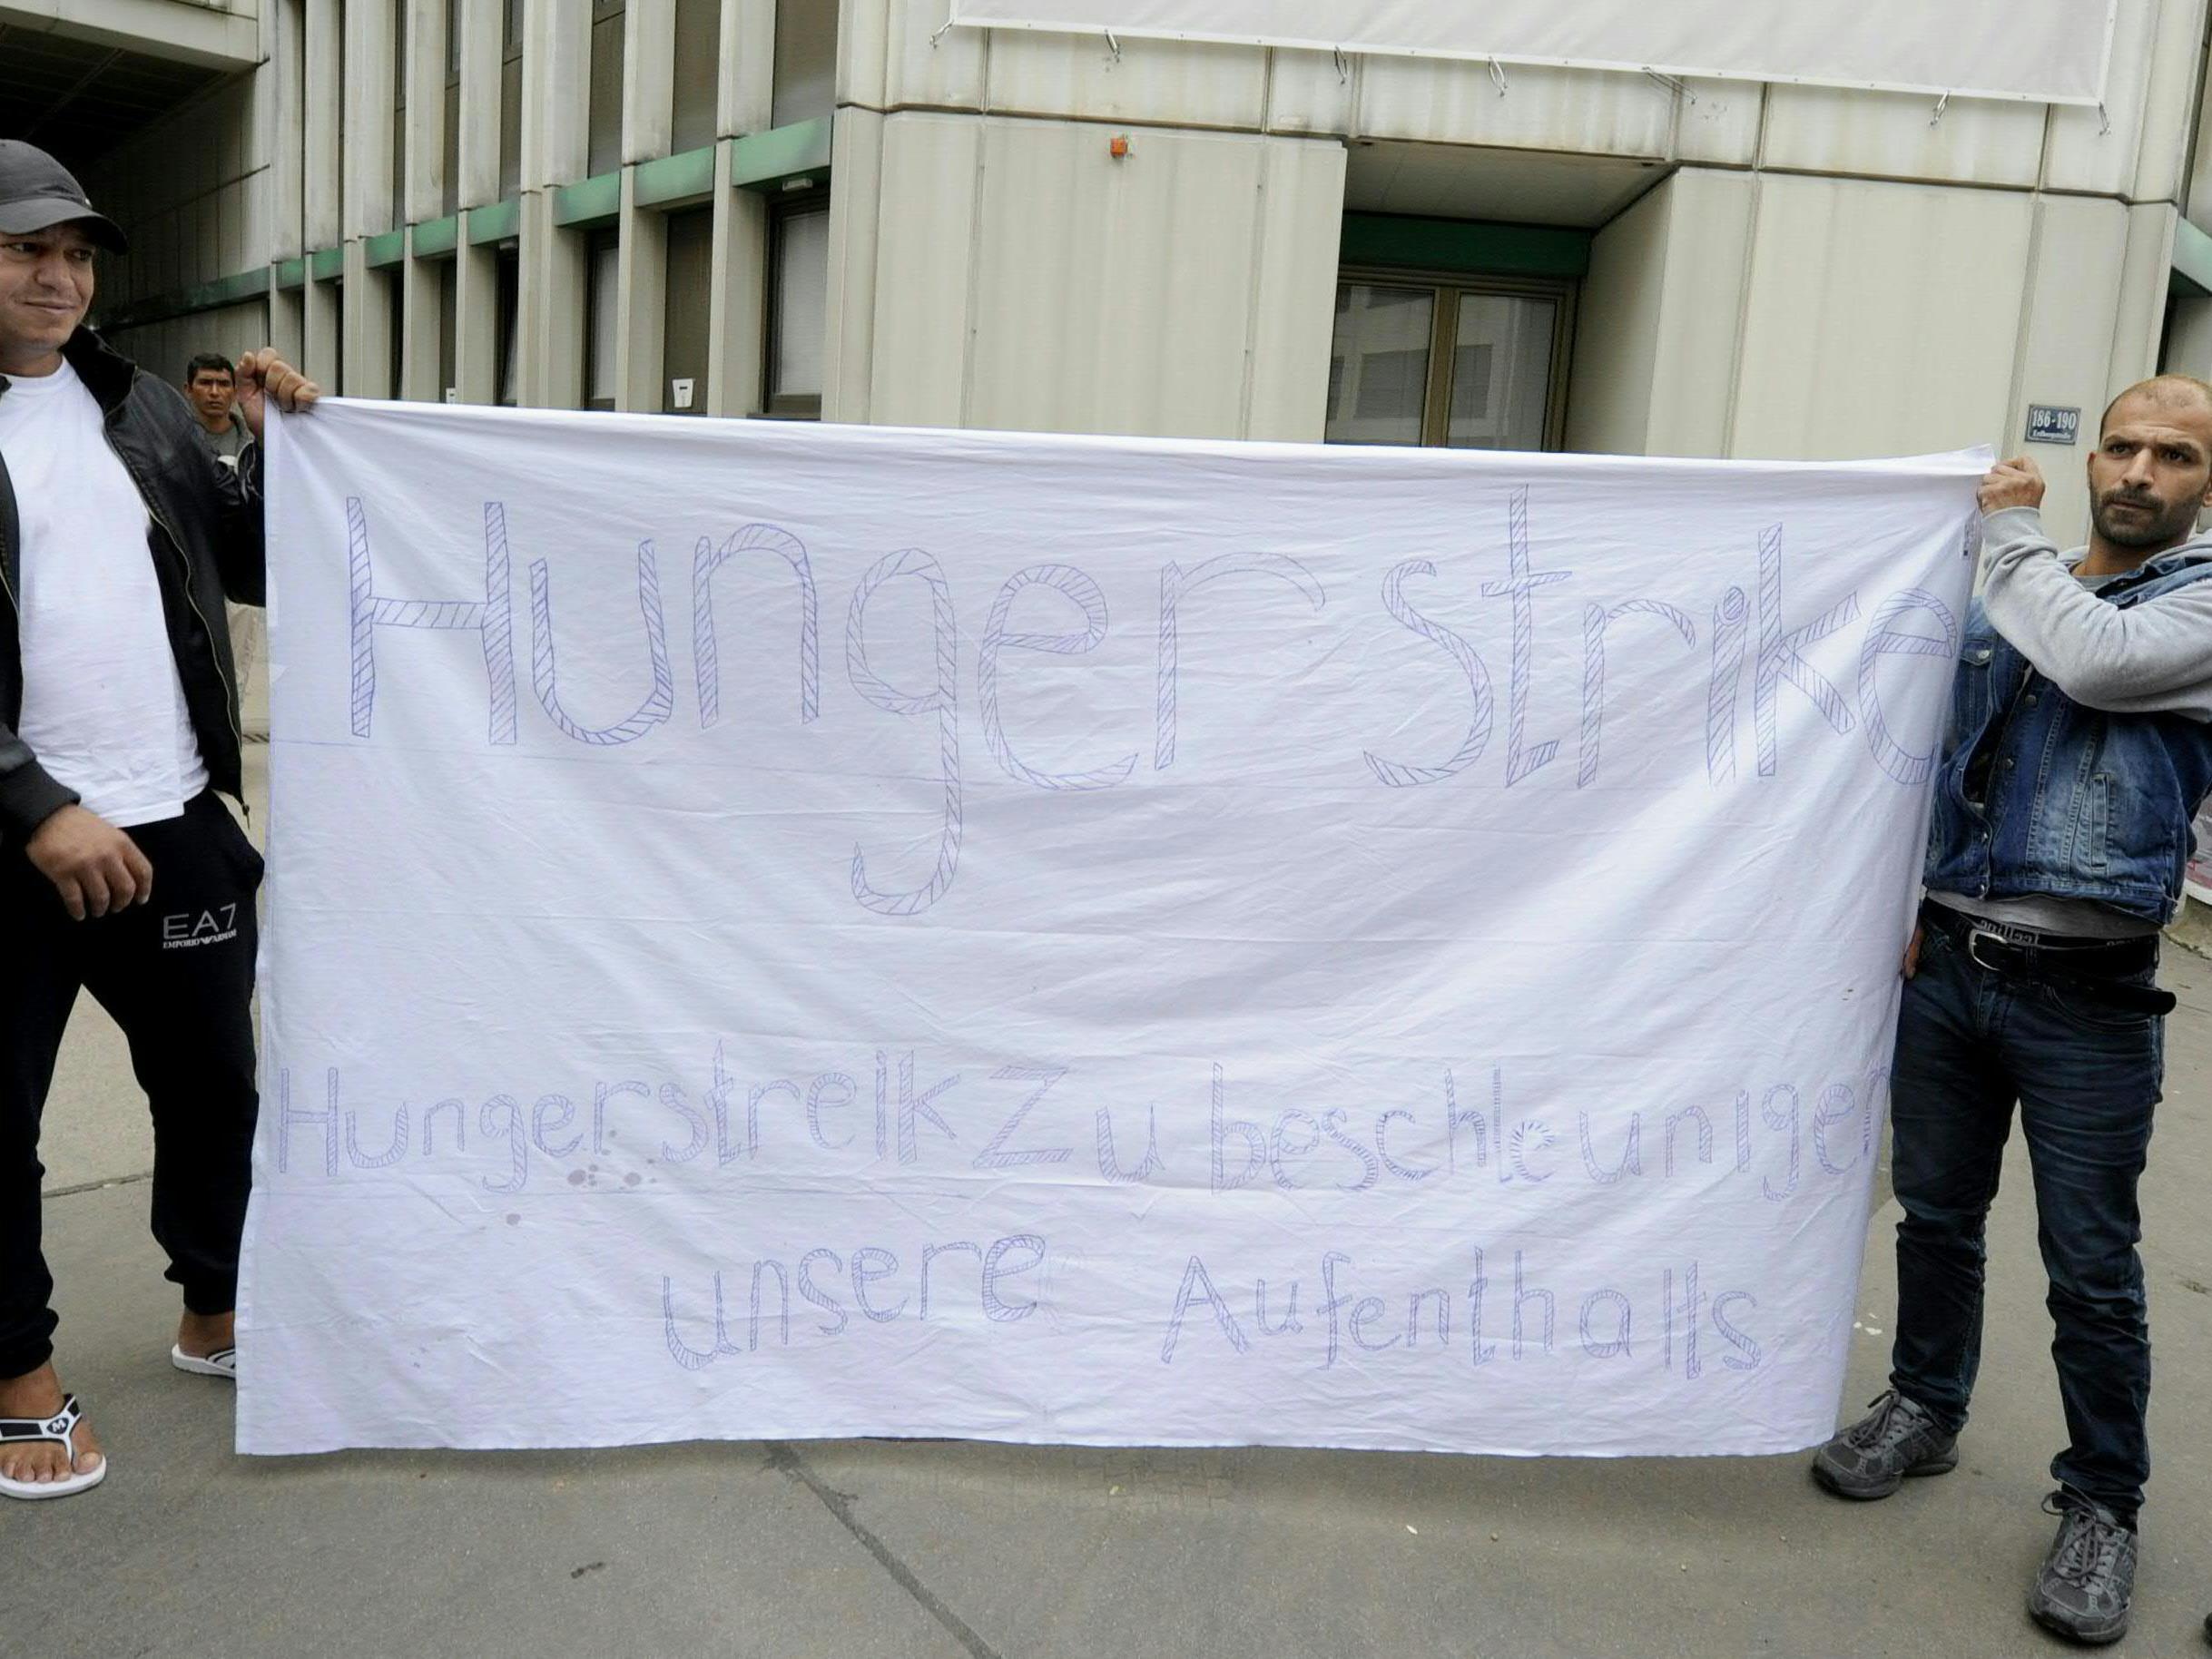 Flüchtlinge in Erdberg kündigen Hungerstreik an